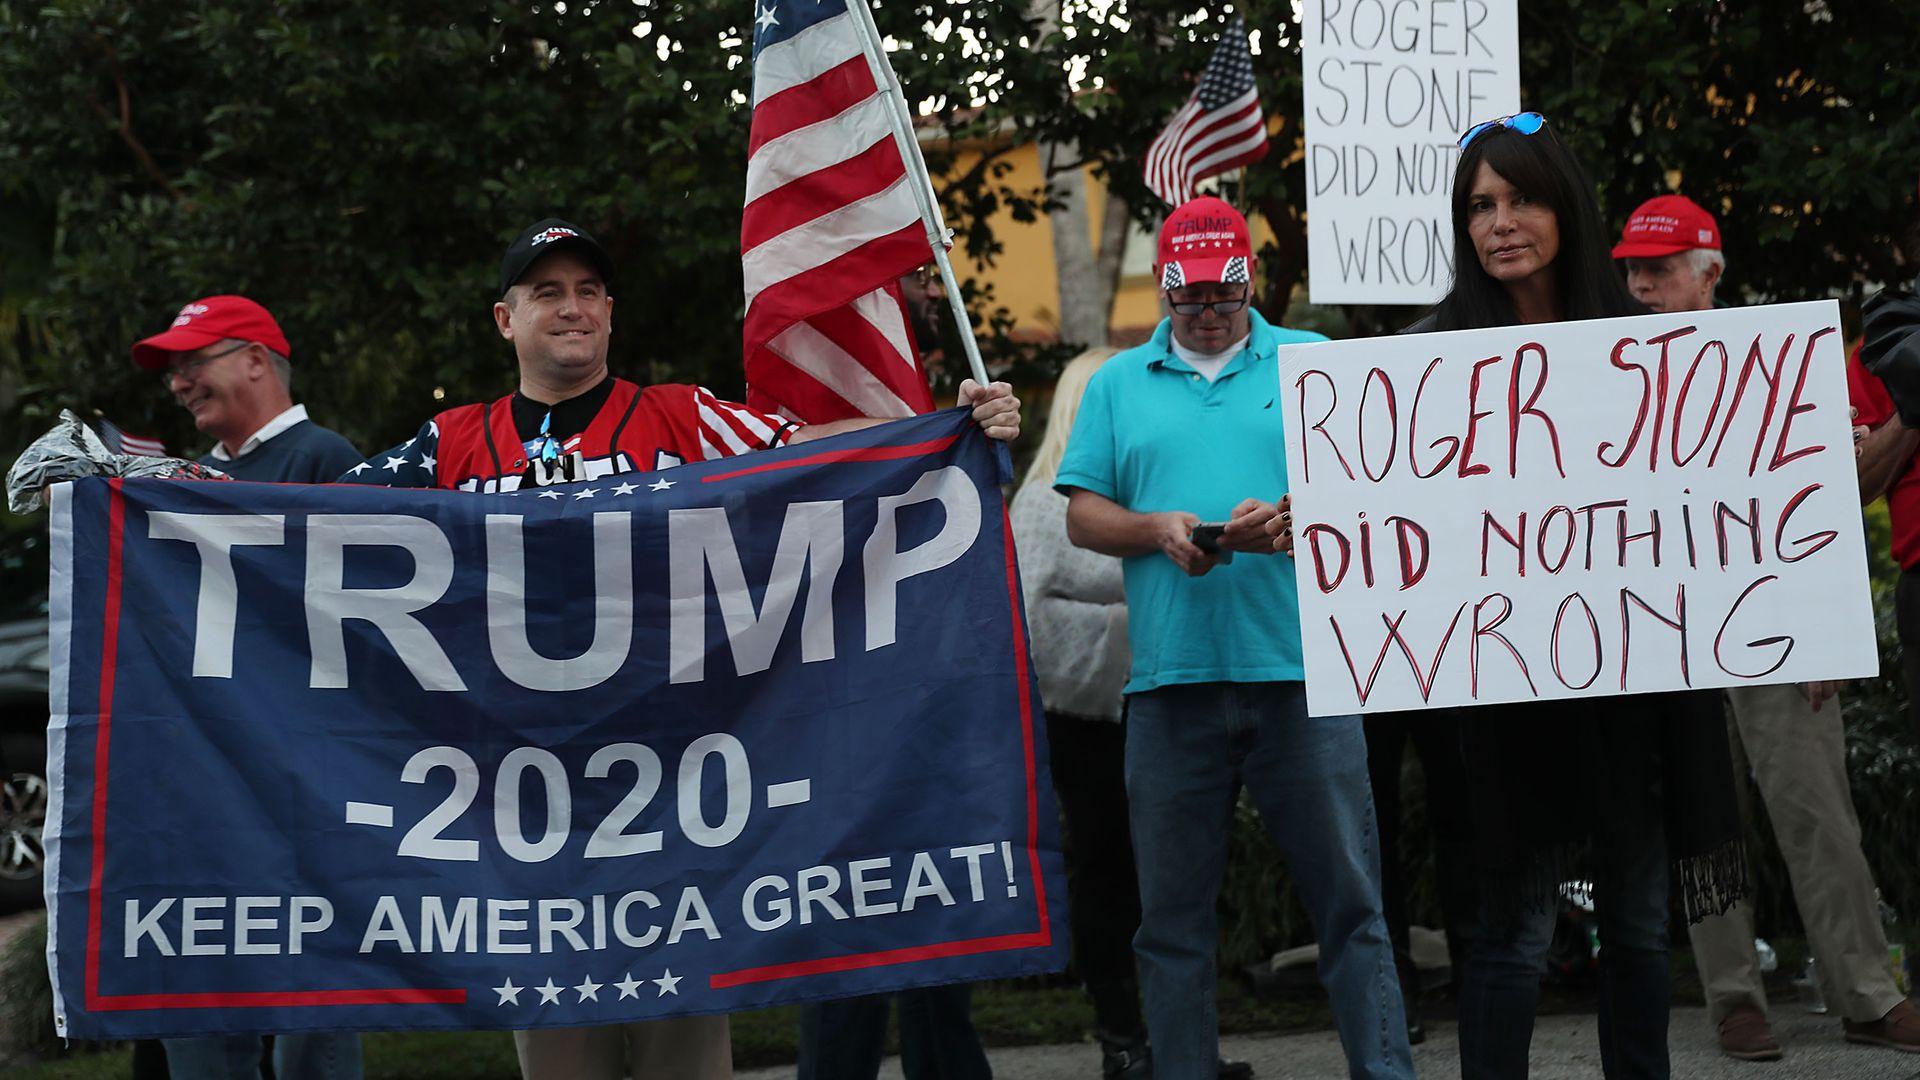 Trump rally for trump 2020